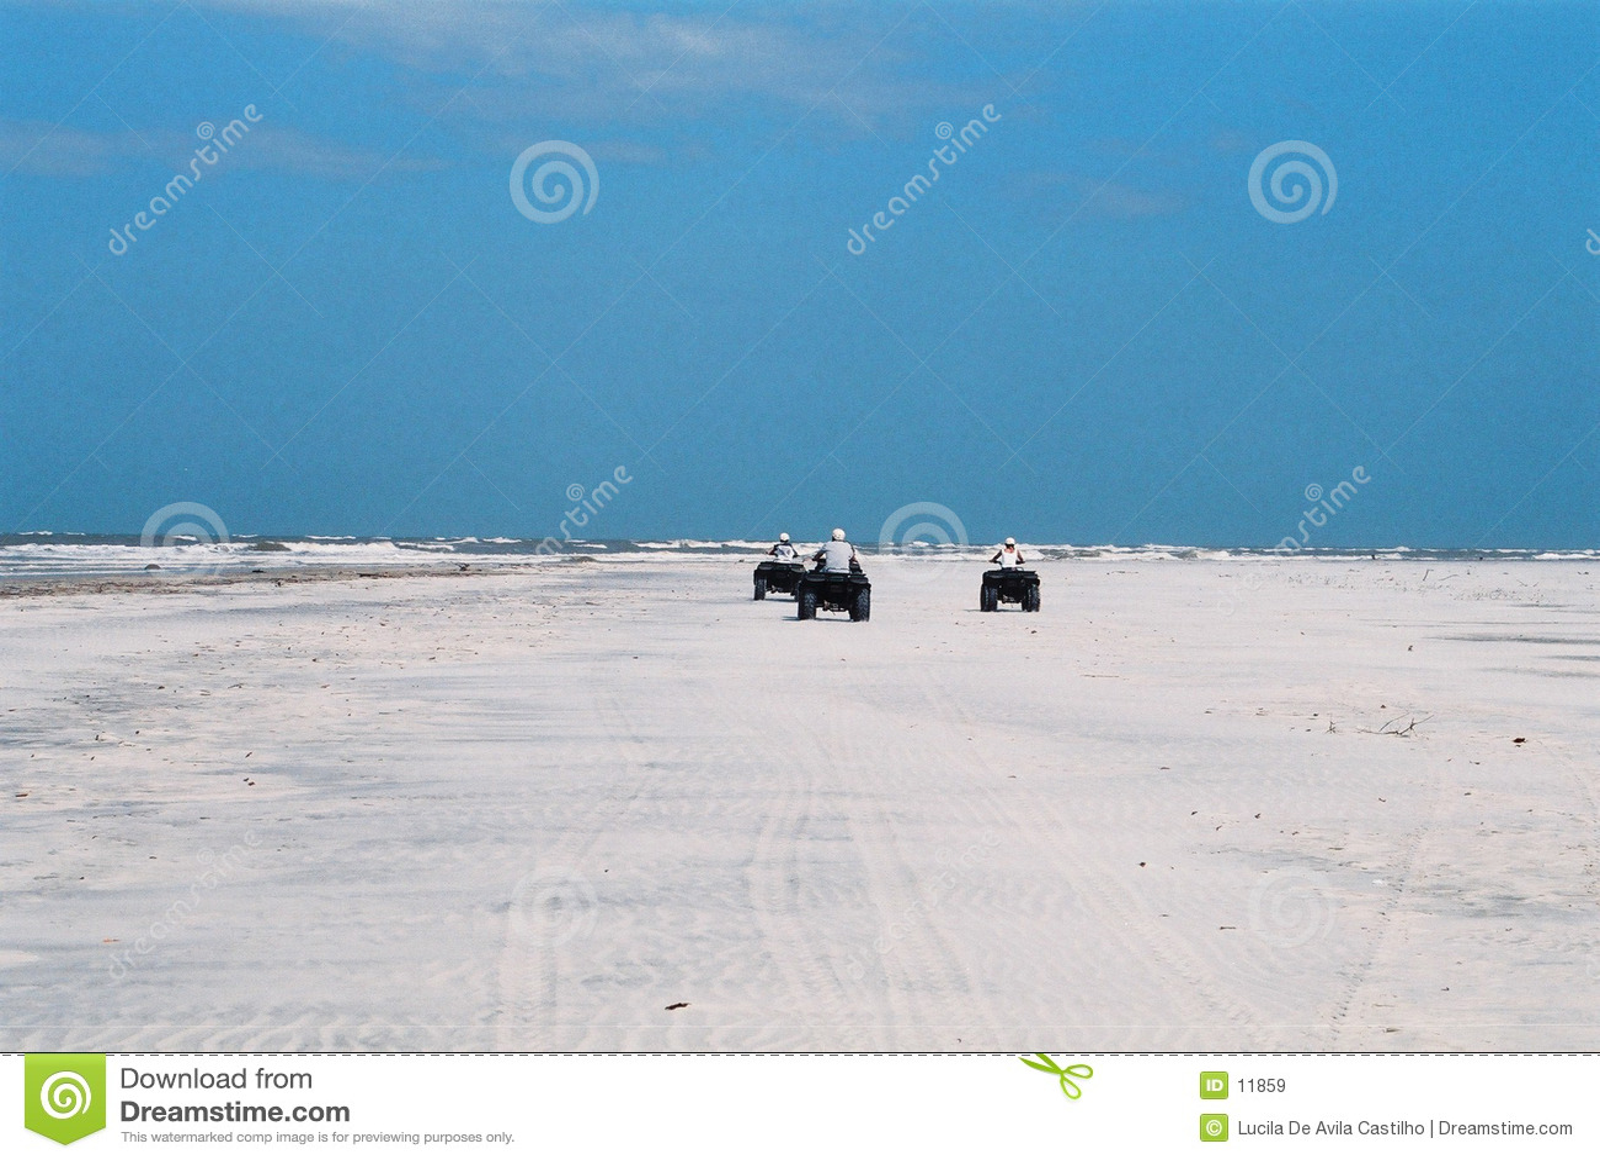 Abenteuer am verlassenen Strand